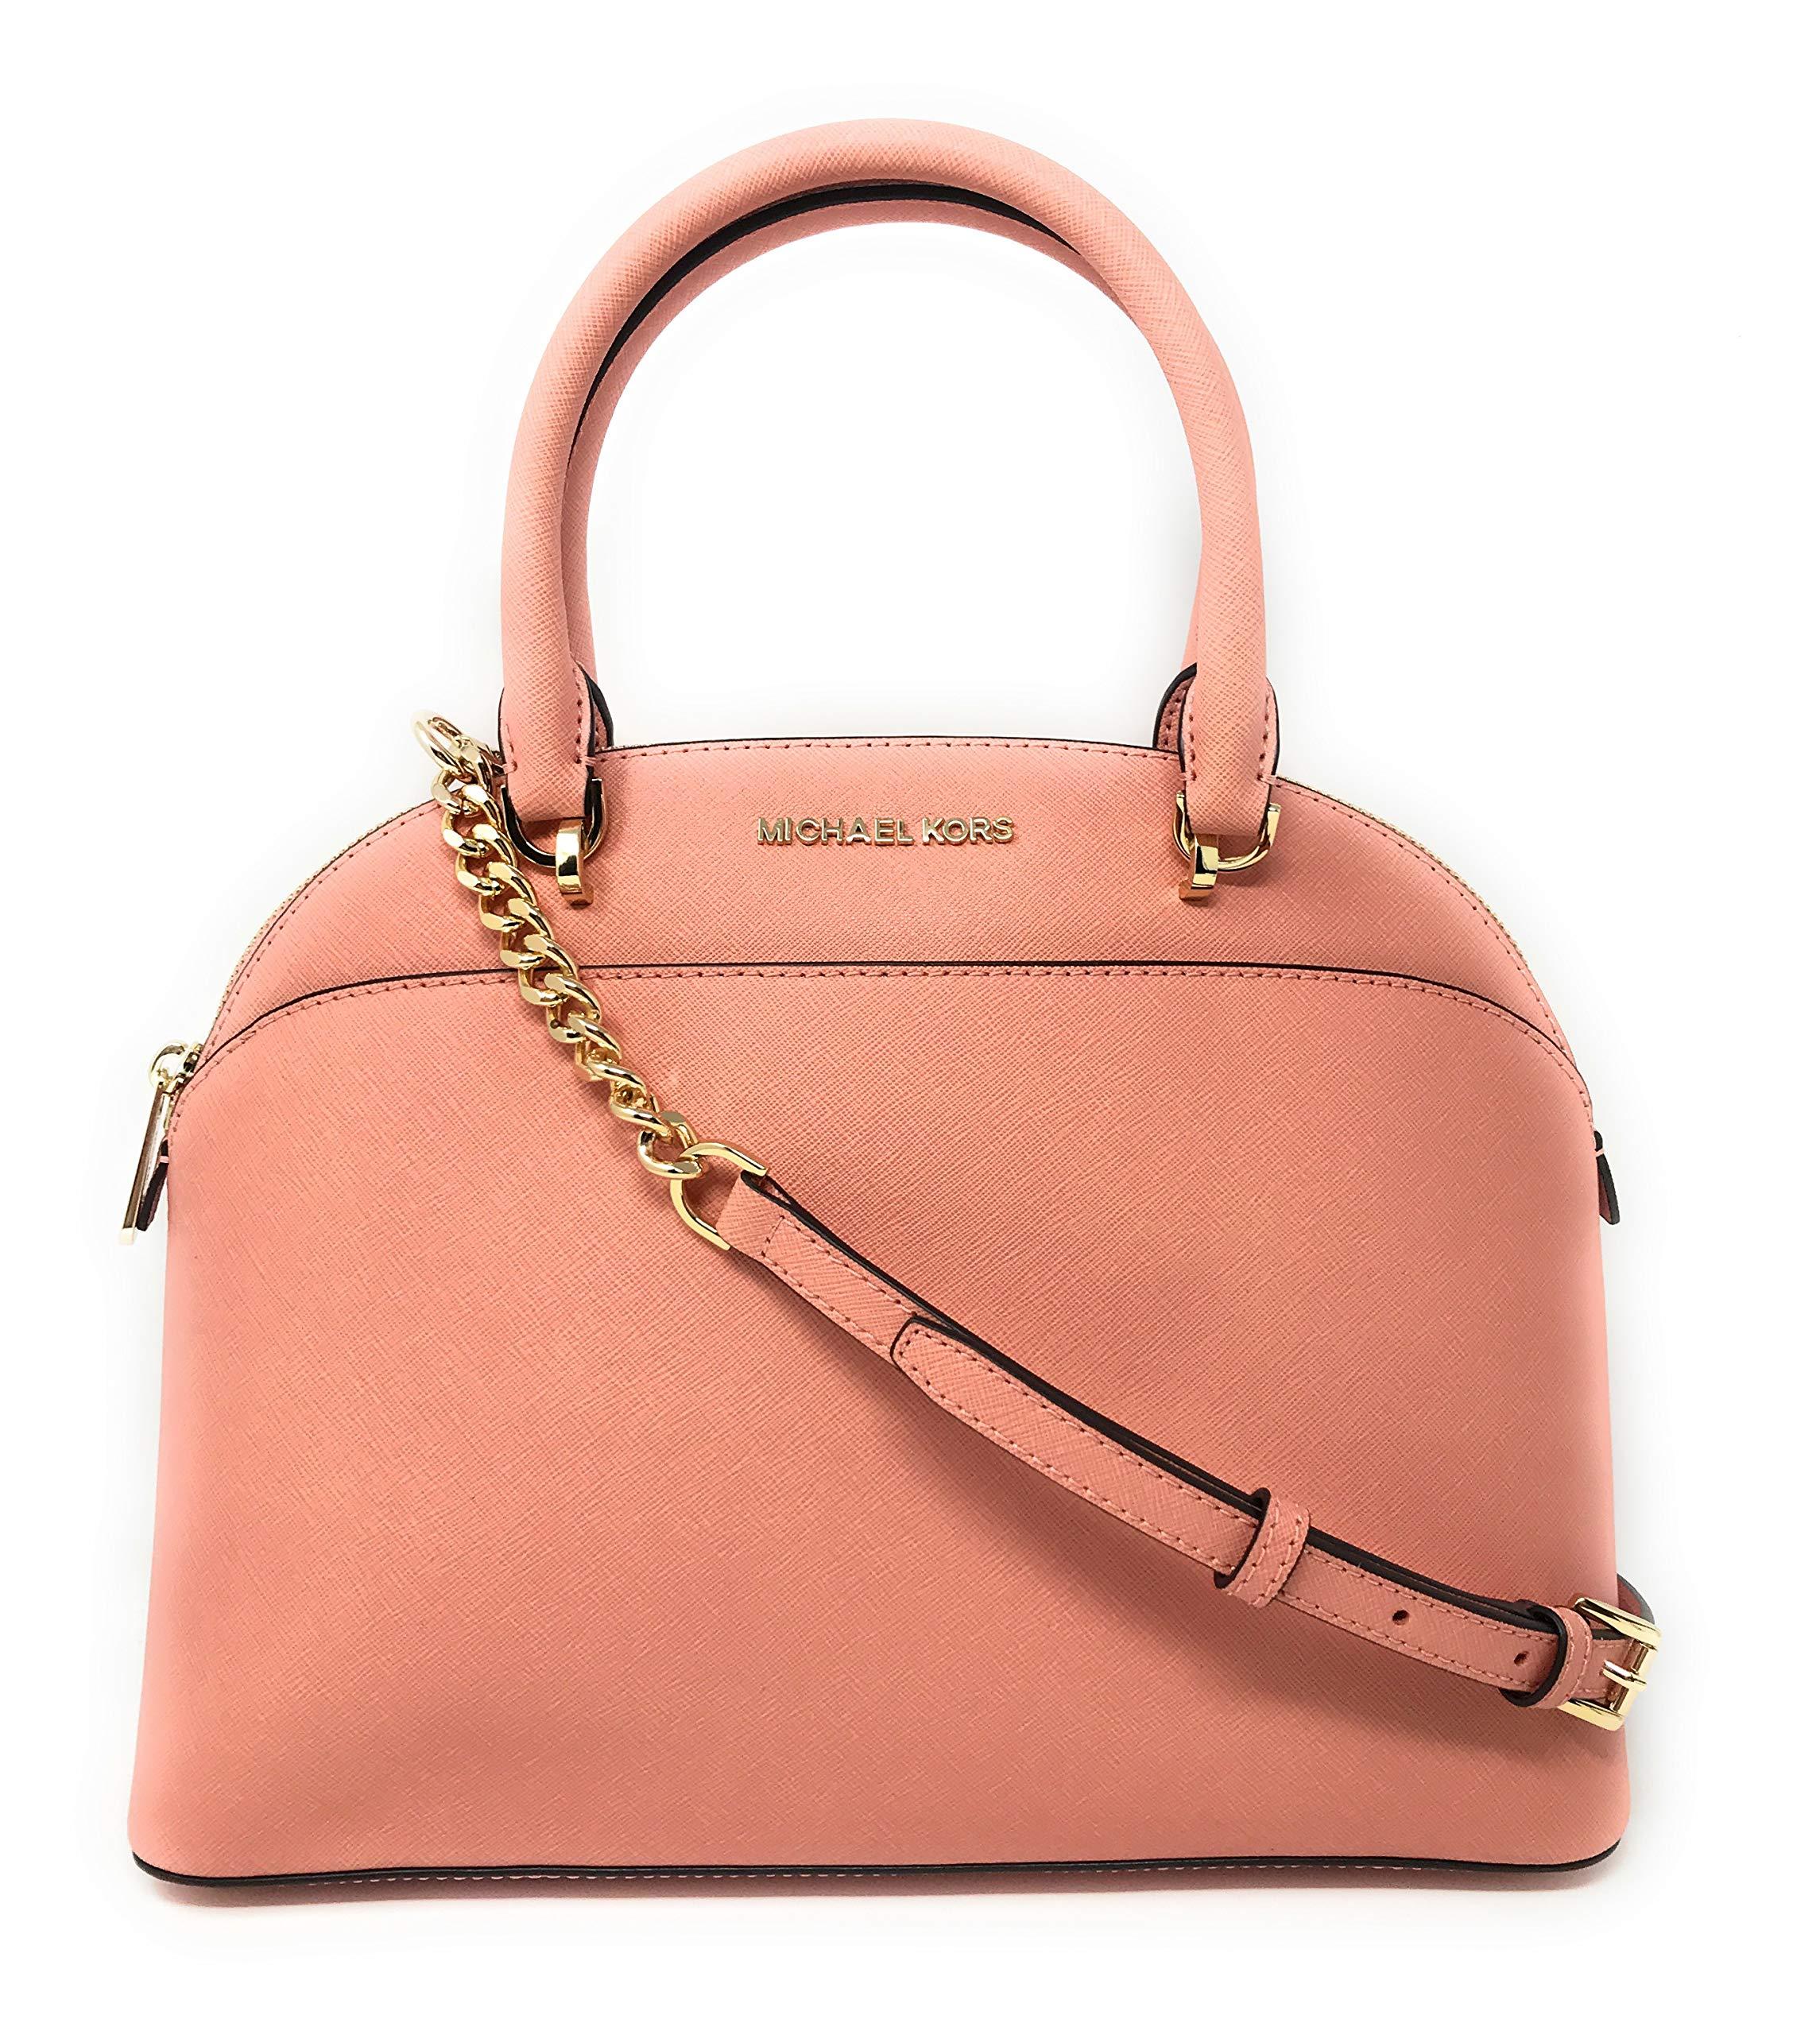 Michael Kors Emmy Large Dome Saffiano Leather Satchel Shoulder Bag Purse Handbag in Peach